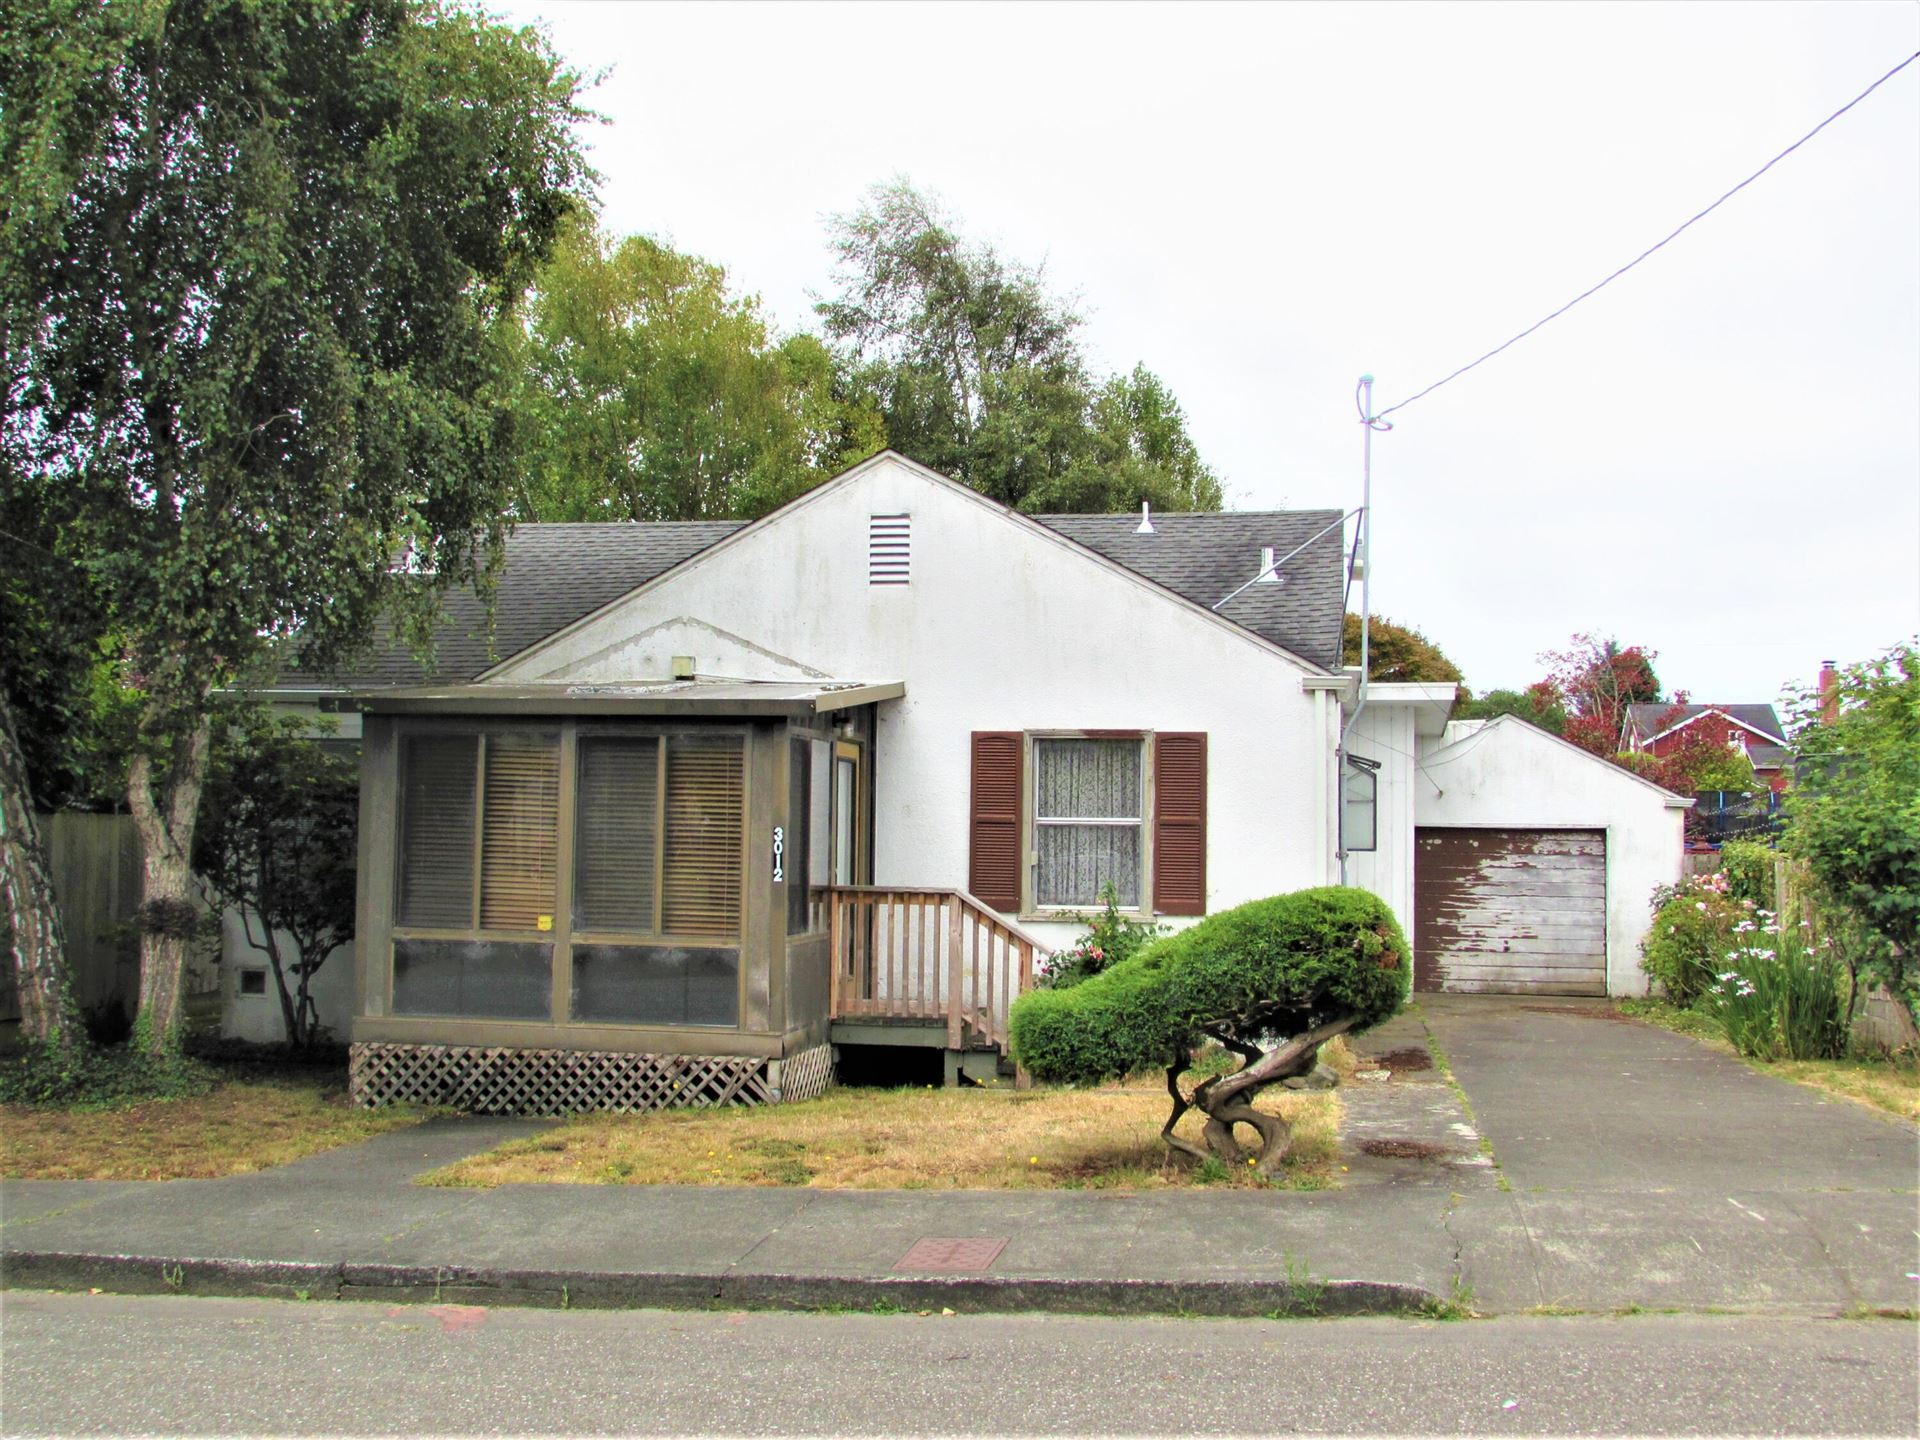 3012 P Street, Eureka, CA 95501 - MLS#: 259982